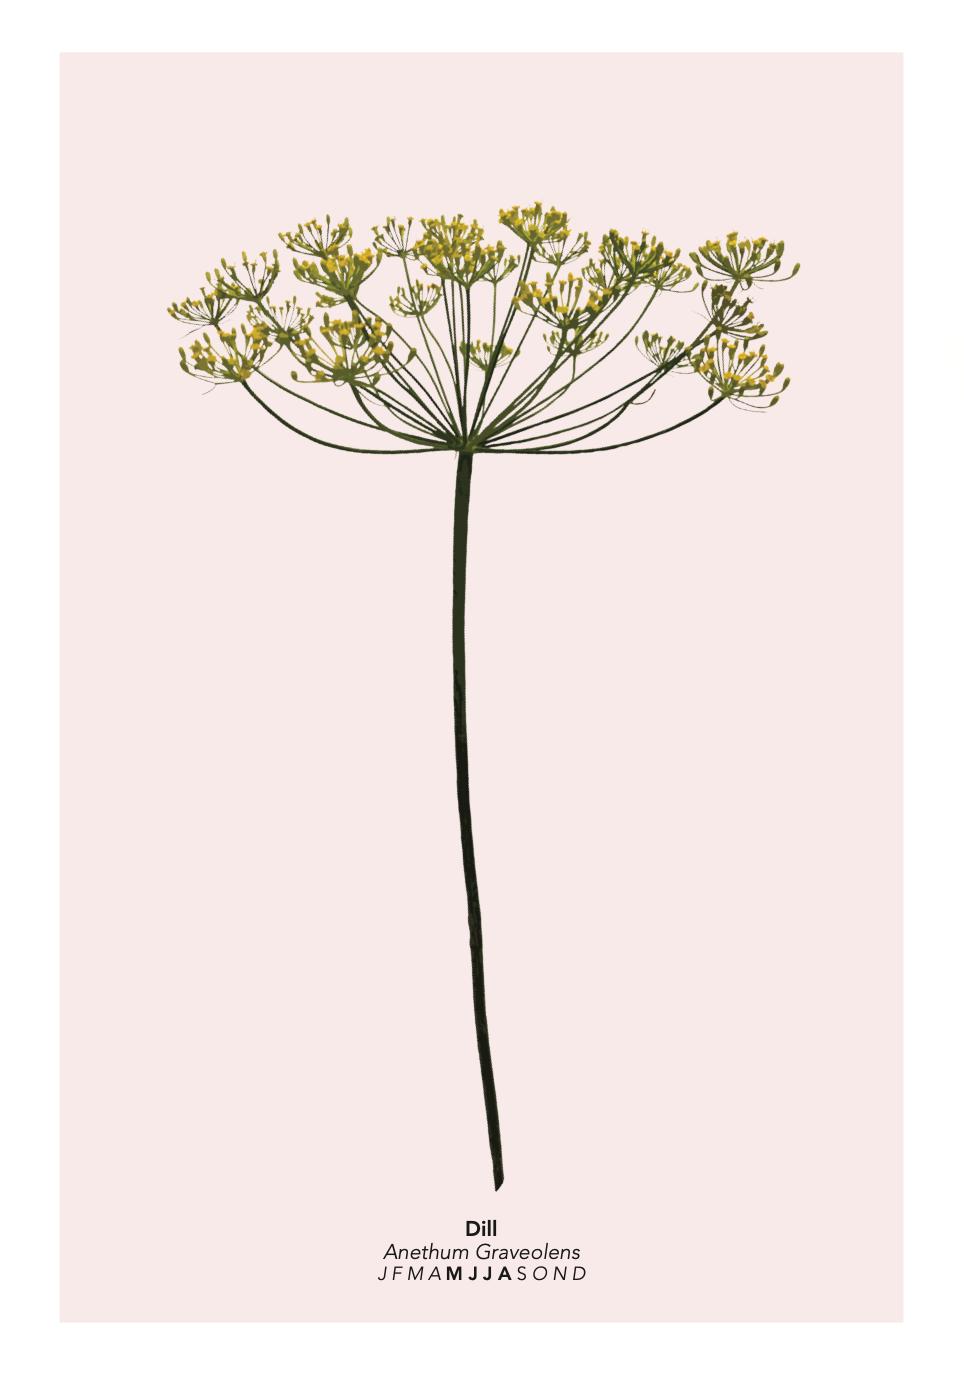 Blumenpost Saisonkalender Blumen Plakat Poster